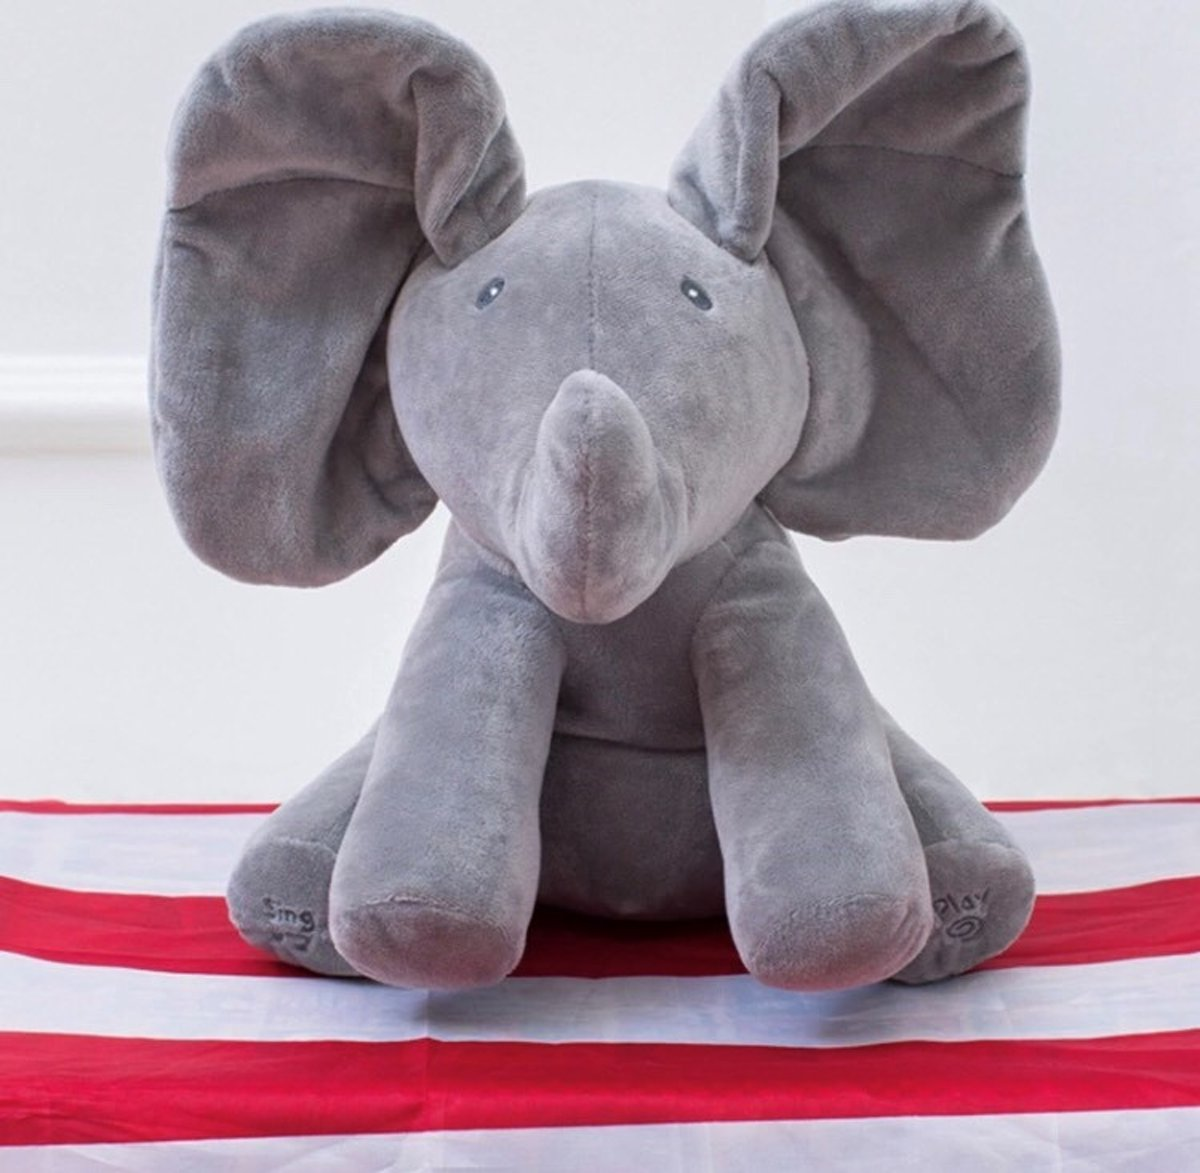 Flappy de olifant - speelt kiekeboe en zingt (Engelstalig) knuffel, olifant knuffel. Het cadeau van 2019!